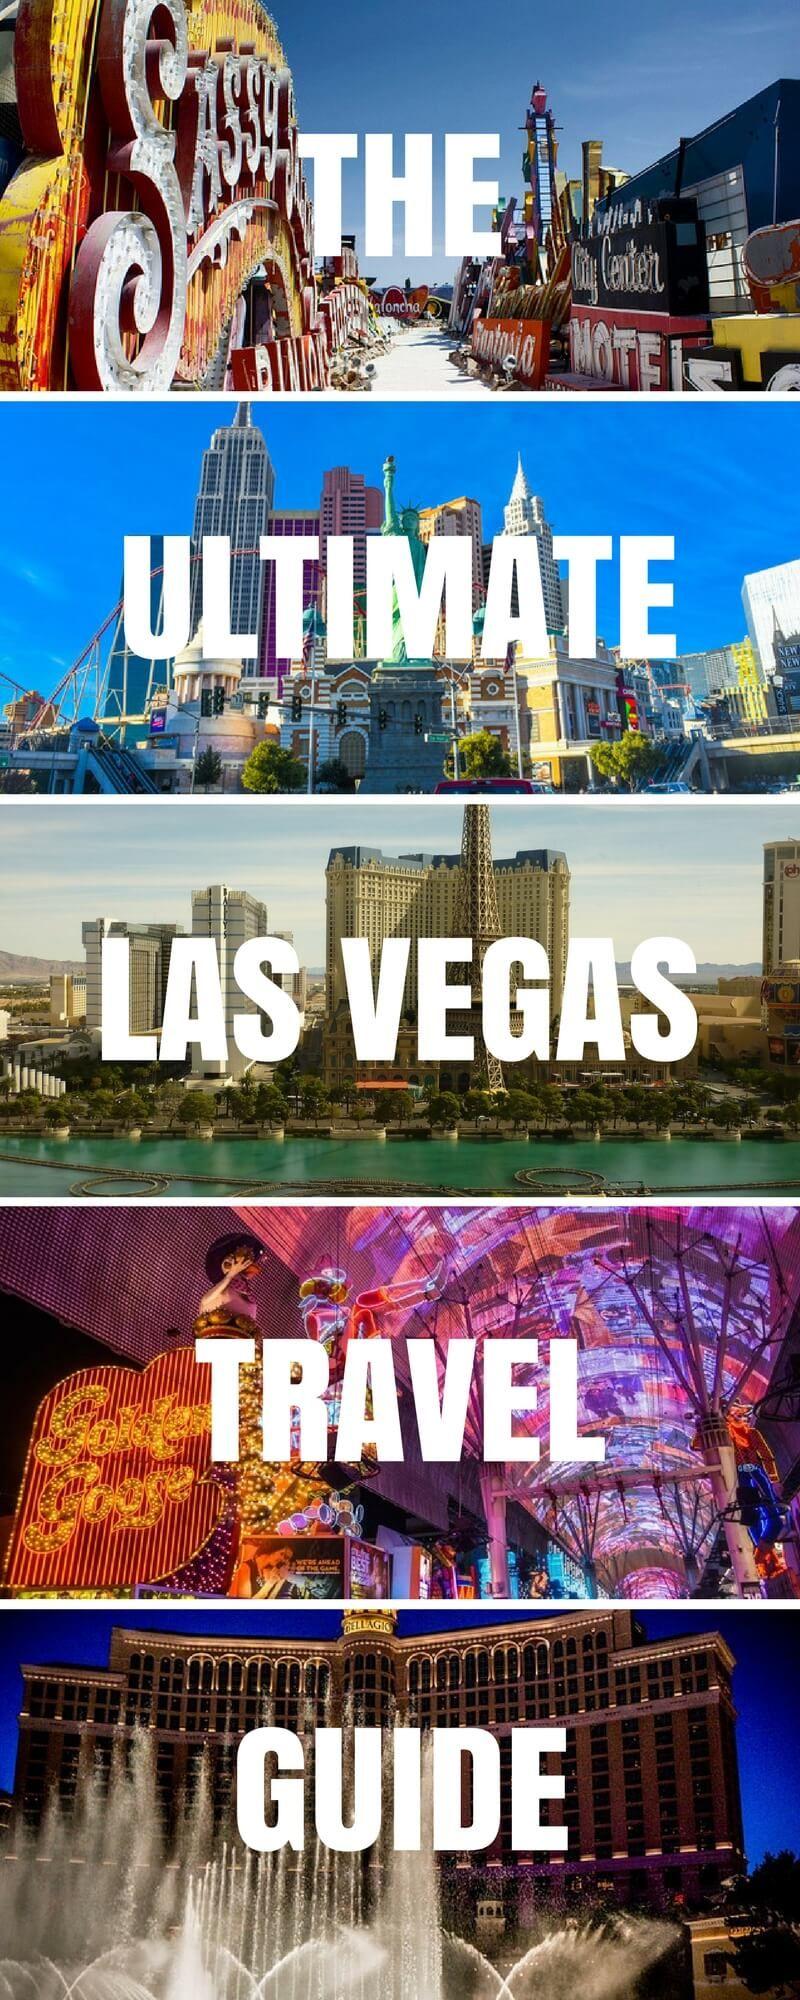 Las travel vegas guide